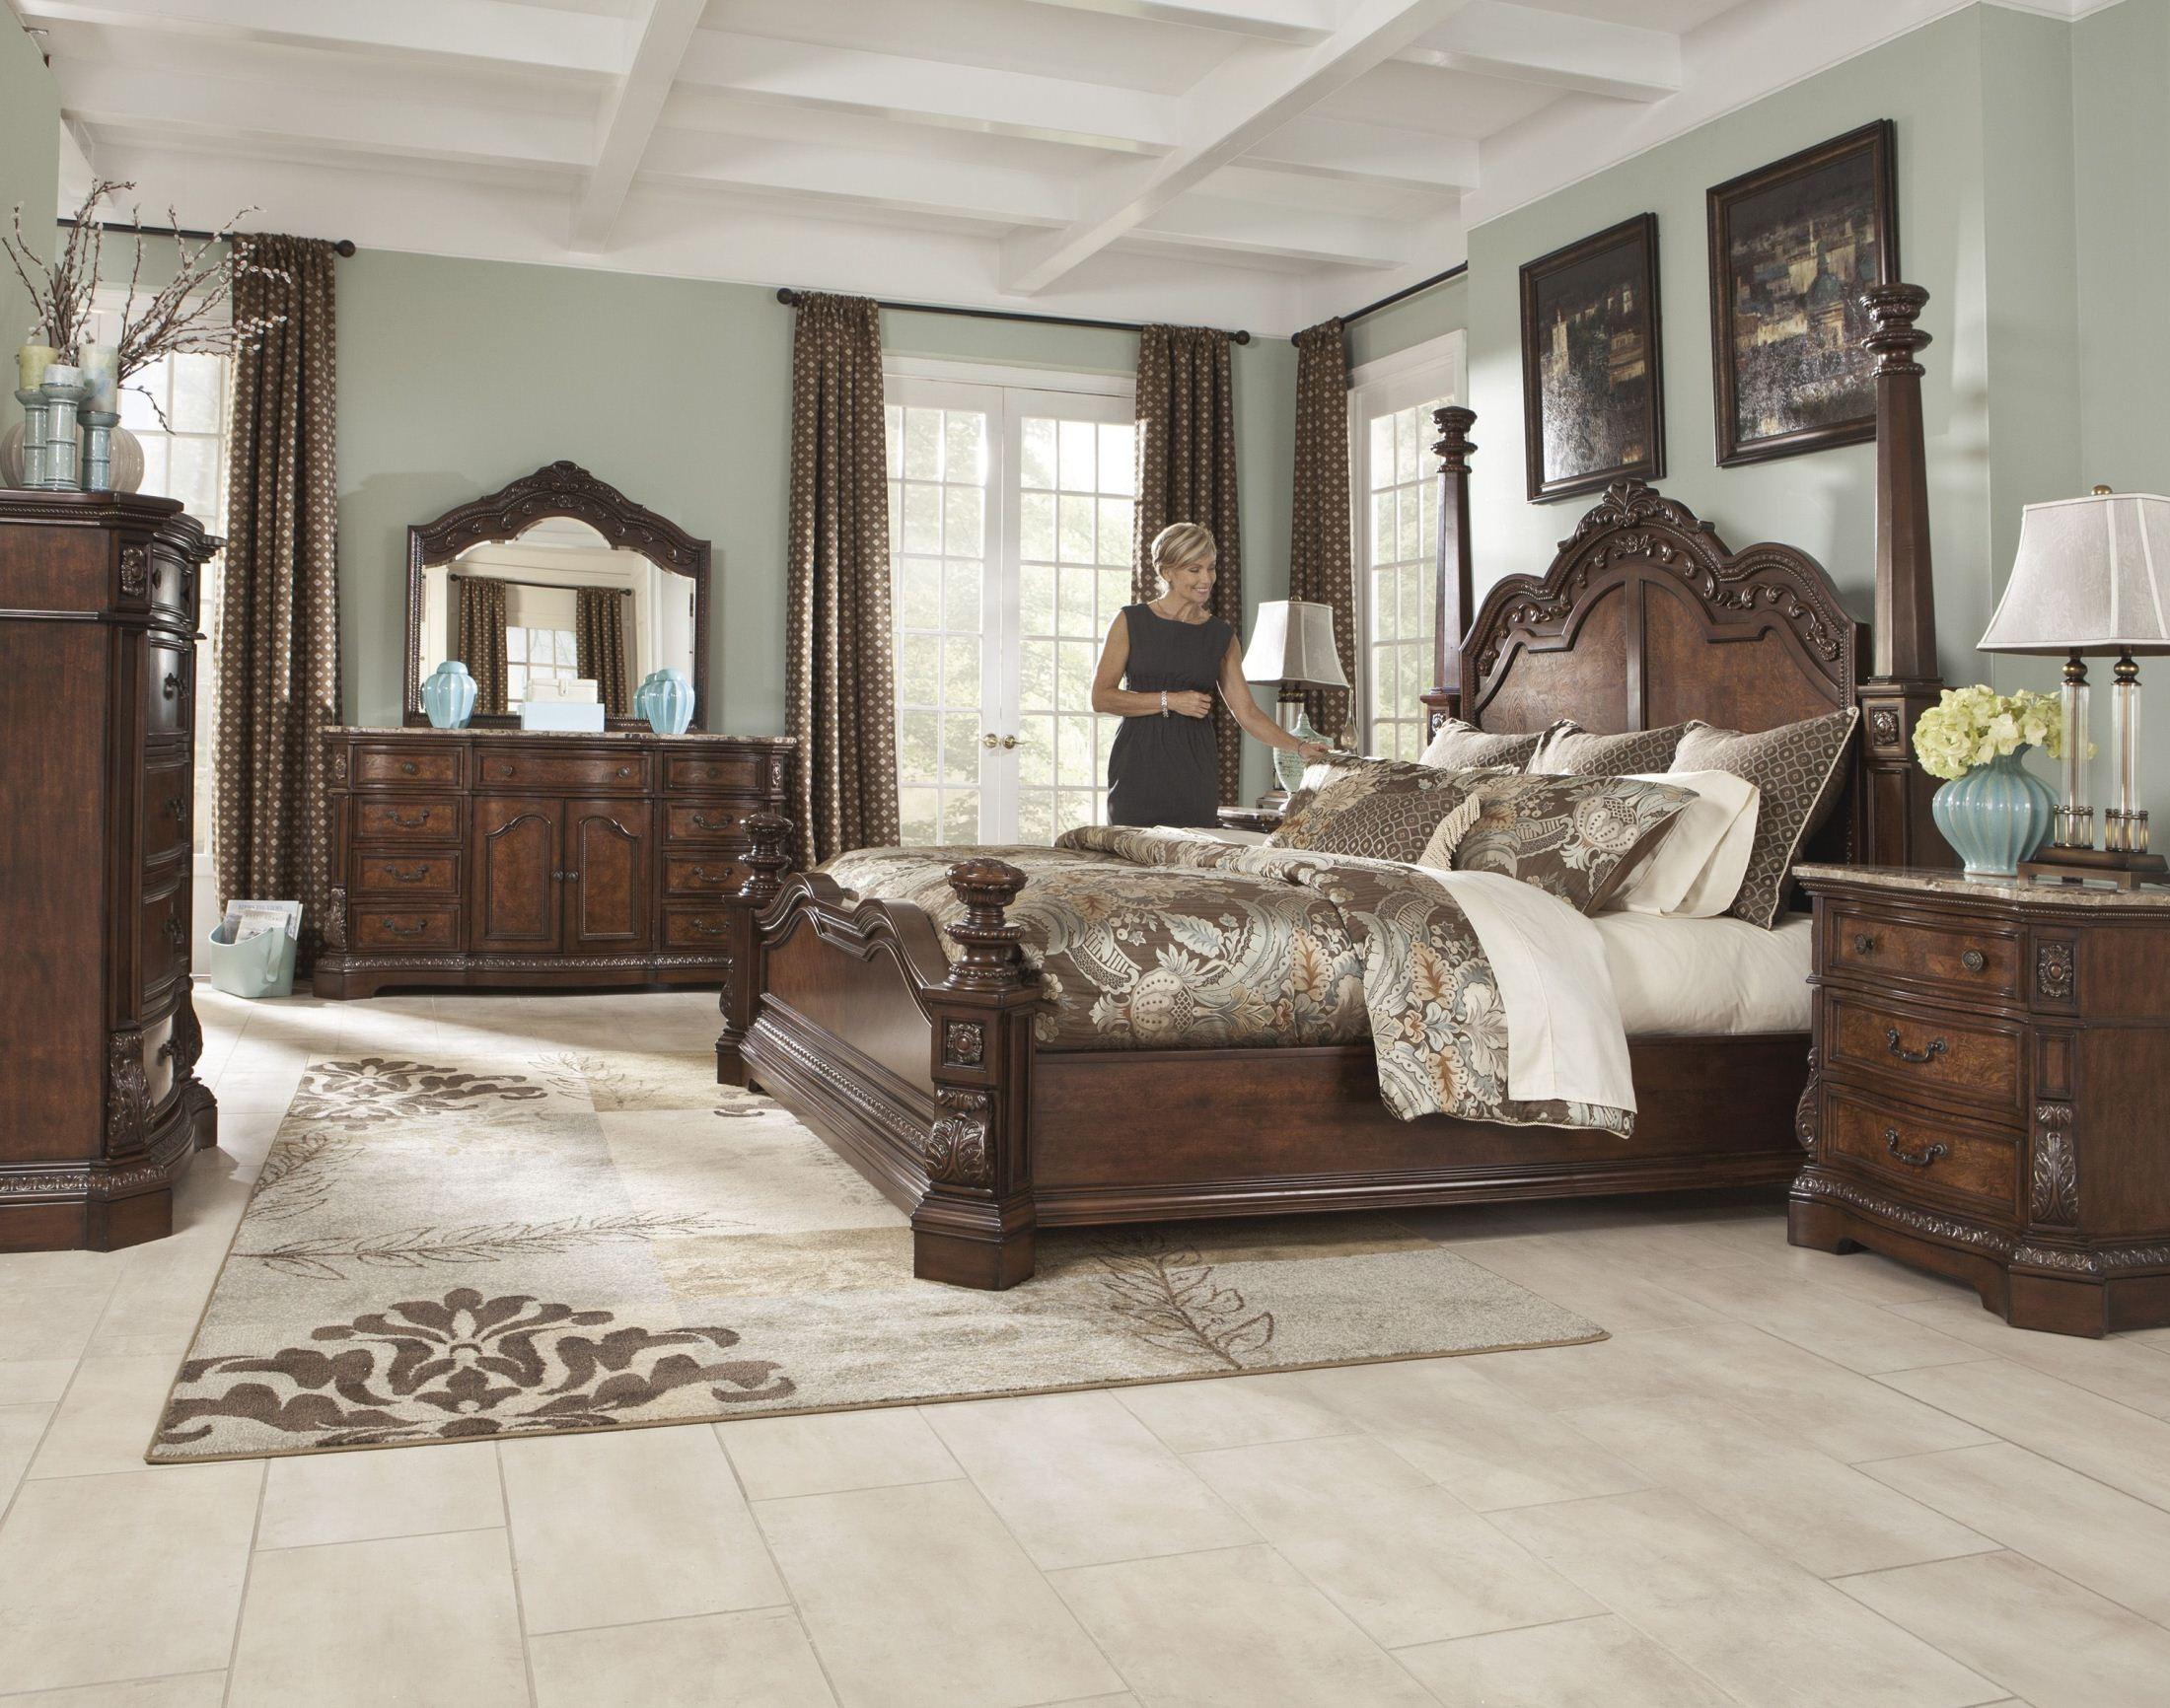 Ledelle Cal King Poster Bed From Ashley B705 51 72 95 Coleman Furniture